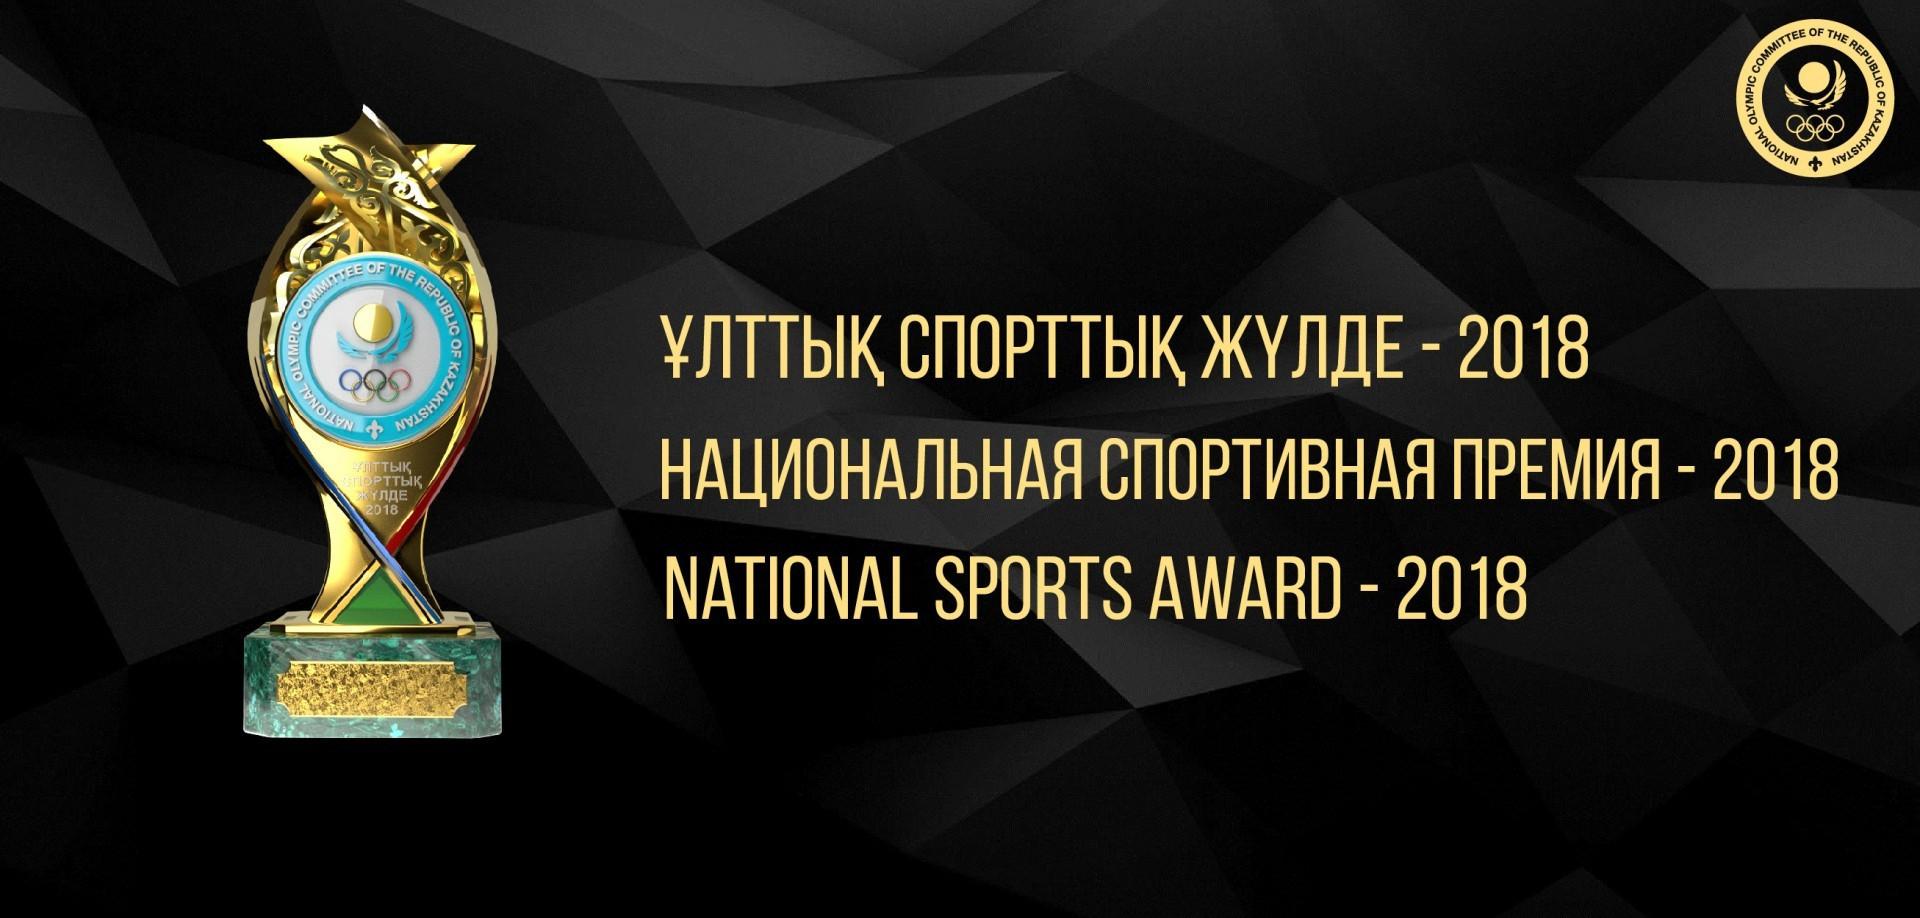 Voting open for Kazakhstan National Sports Awards